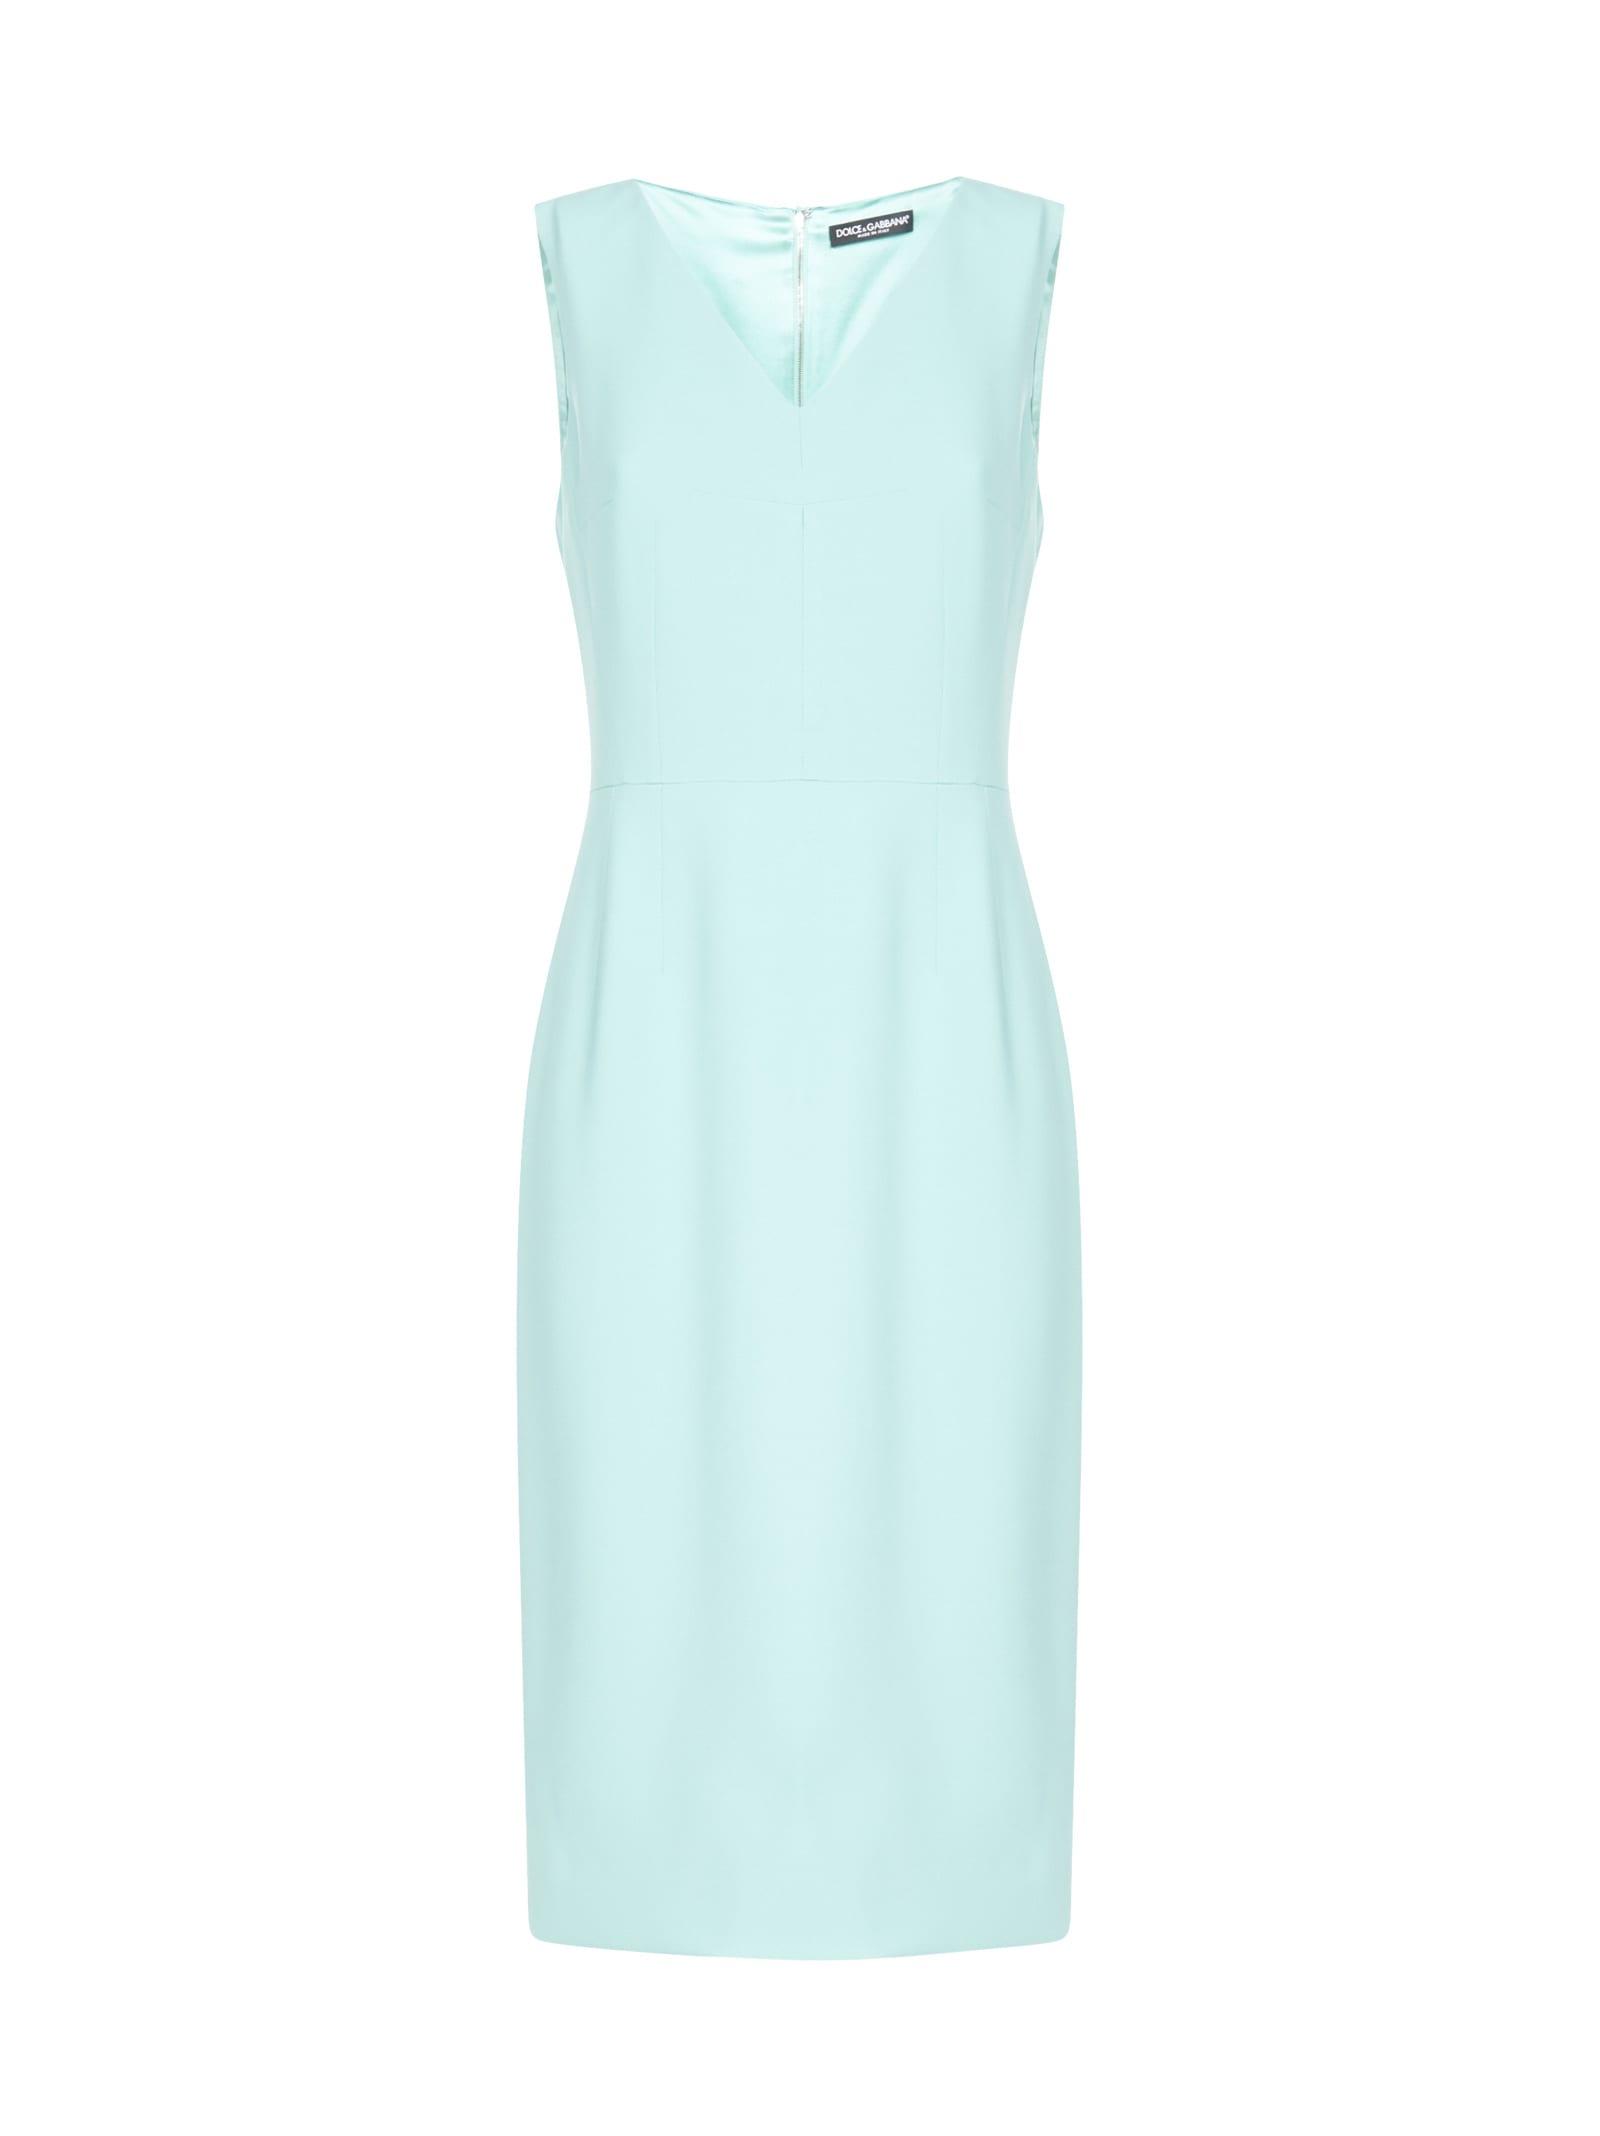 Buy Dolce & Gabbana V Neck Dress online, shop Dolce & Gabbana with free shipping